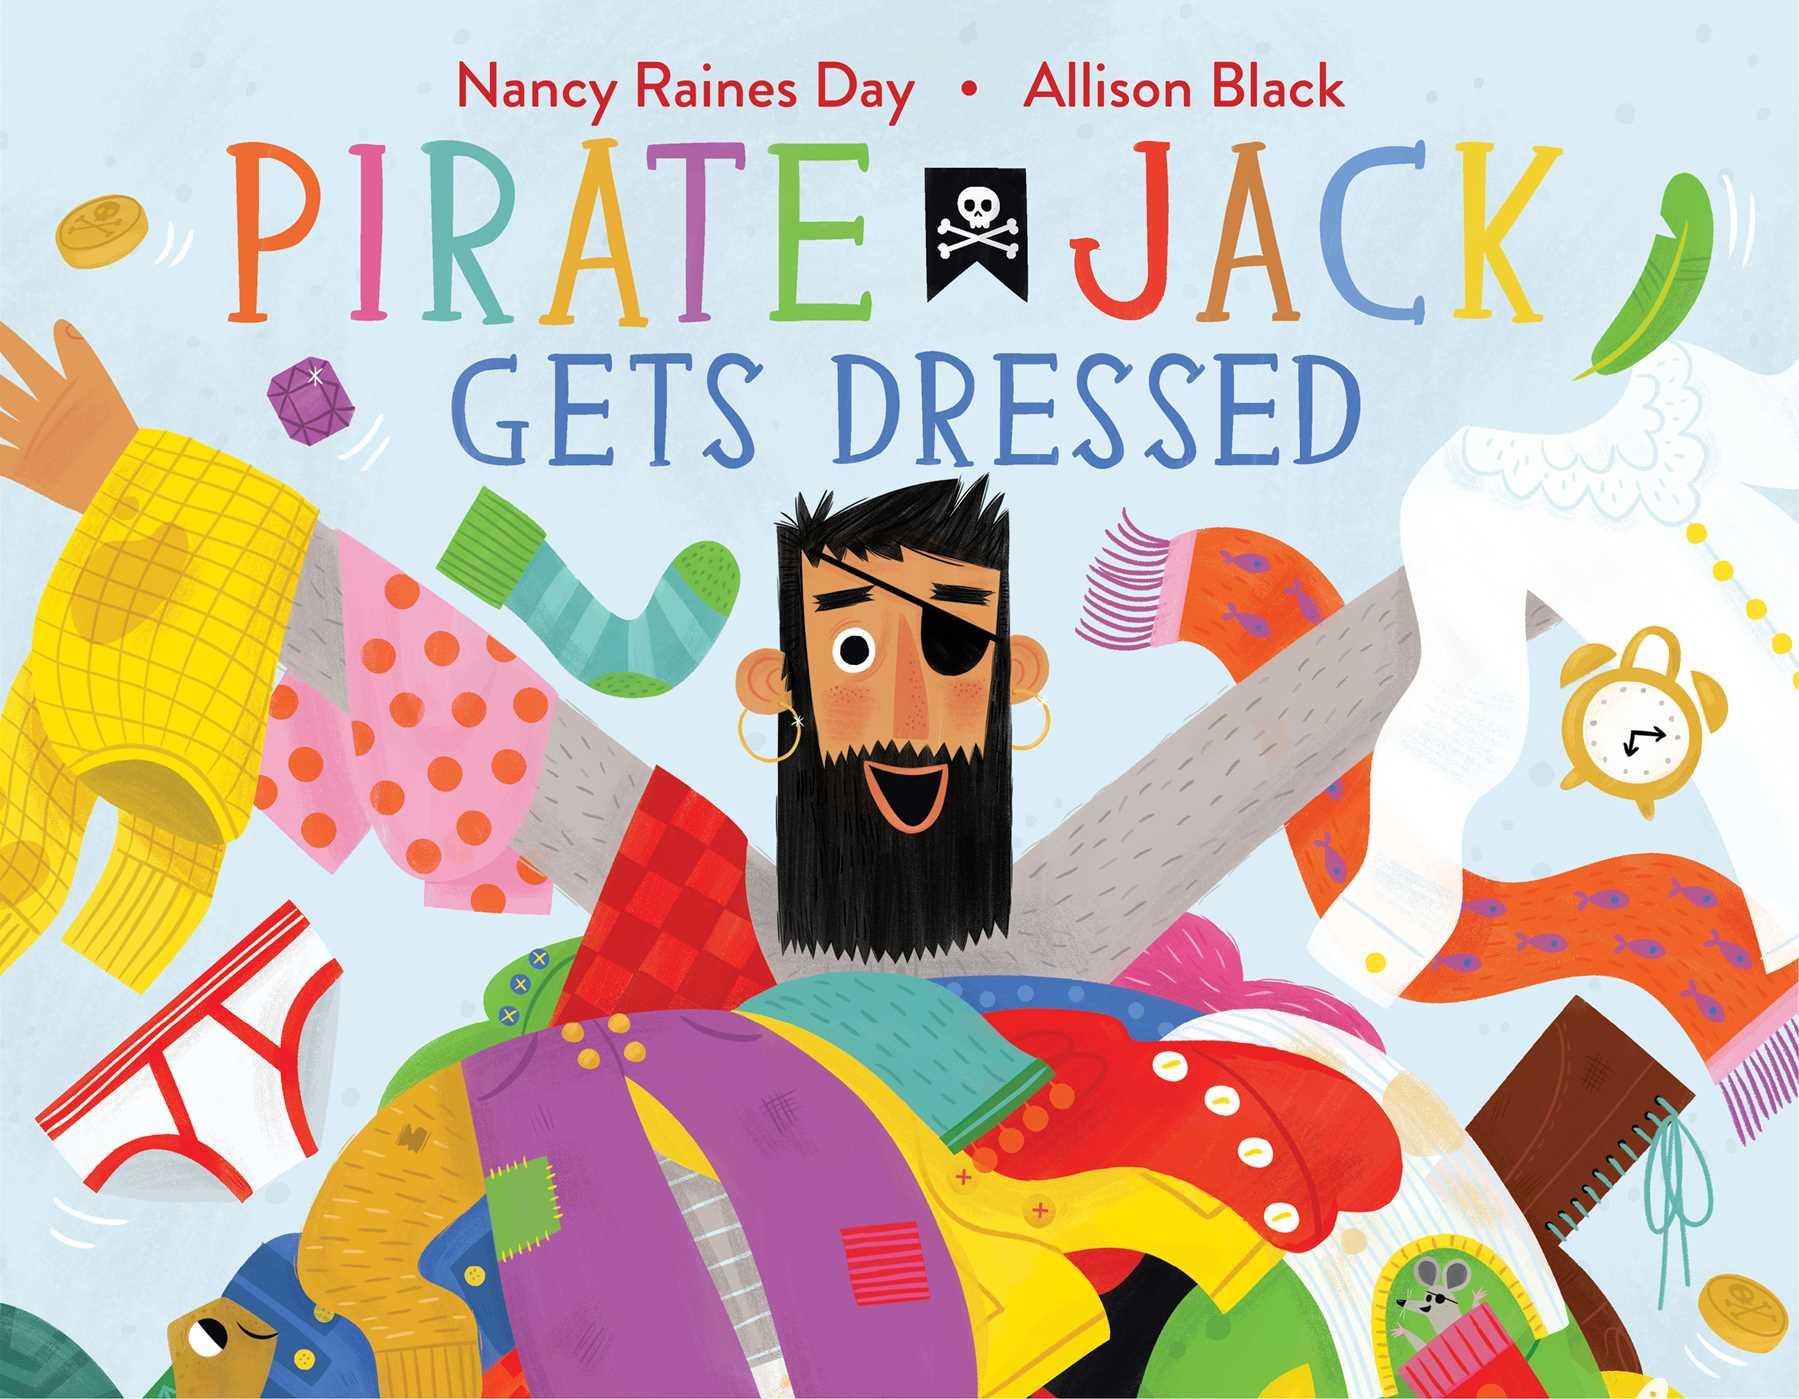 Pirate jack gets dressed 9781481476645 hr